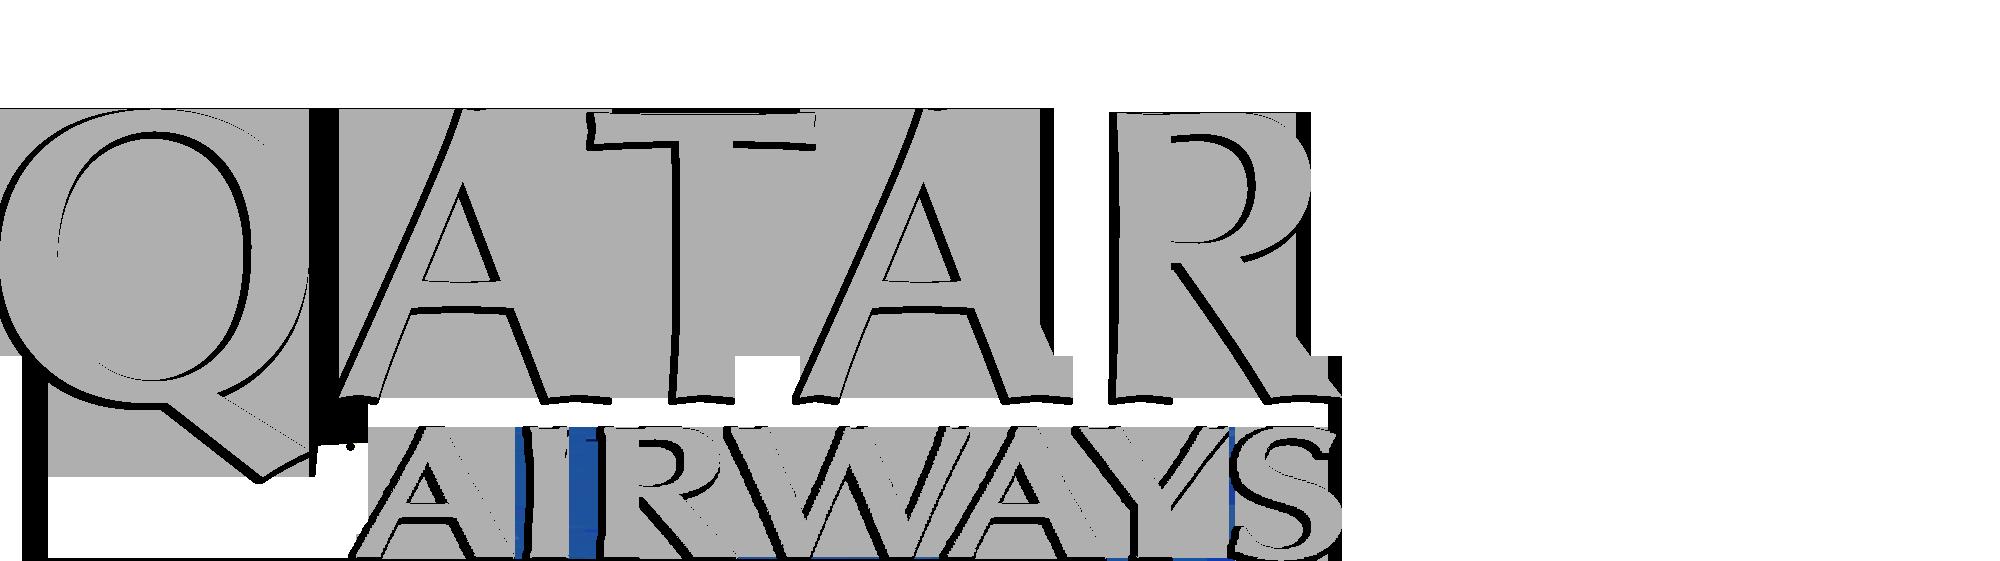 Qatar Airways logo   Qatar Airways   Logos, Vector free